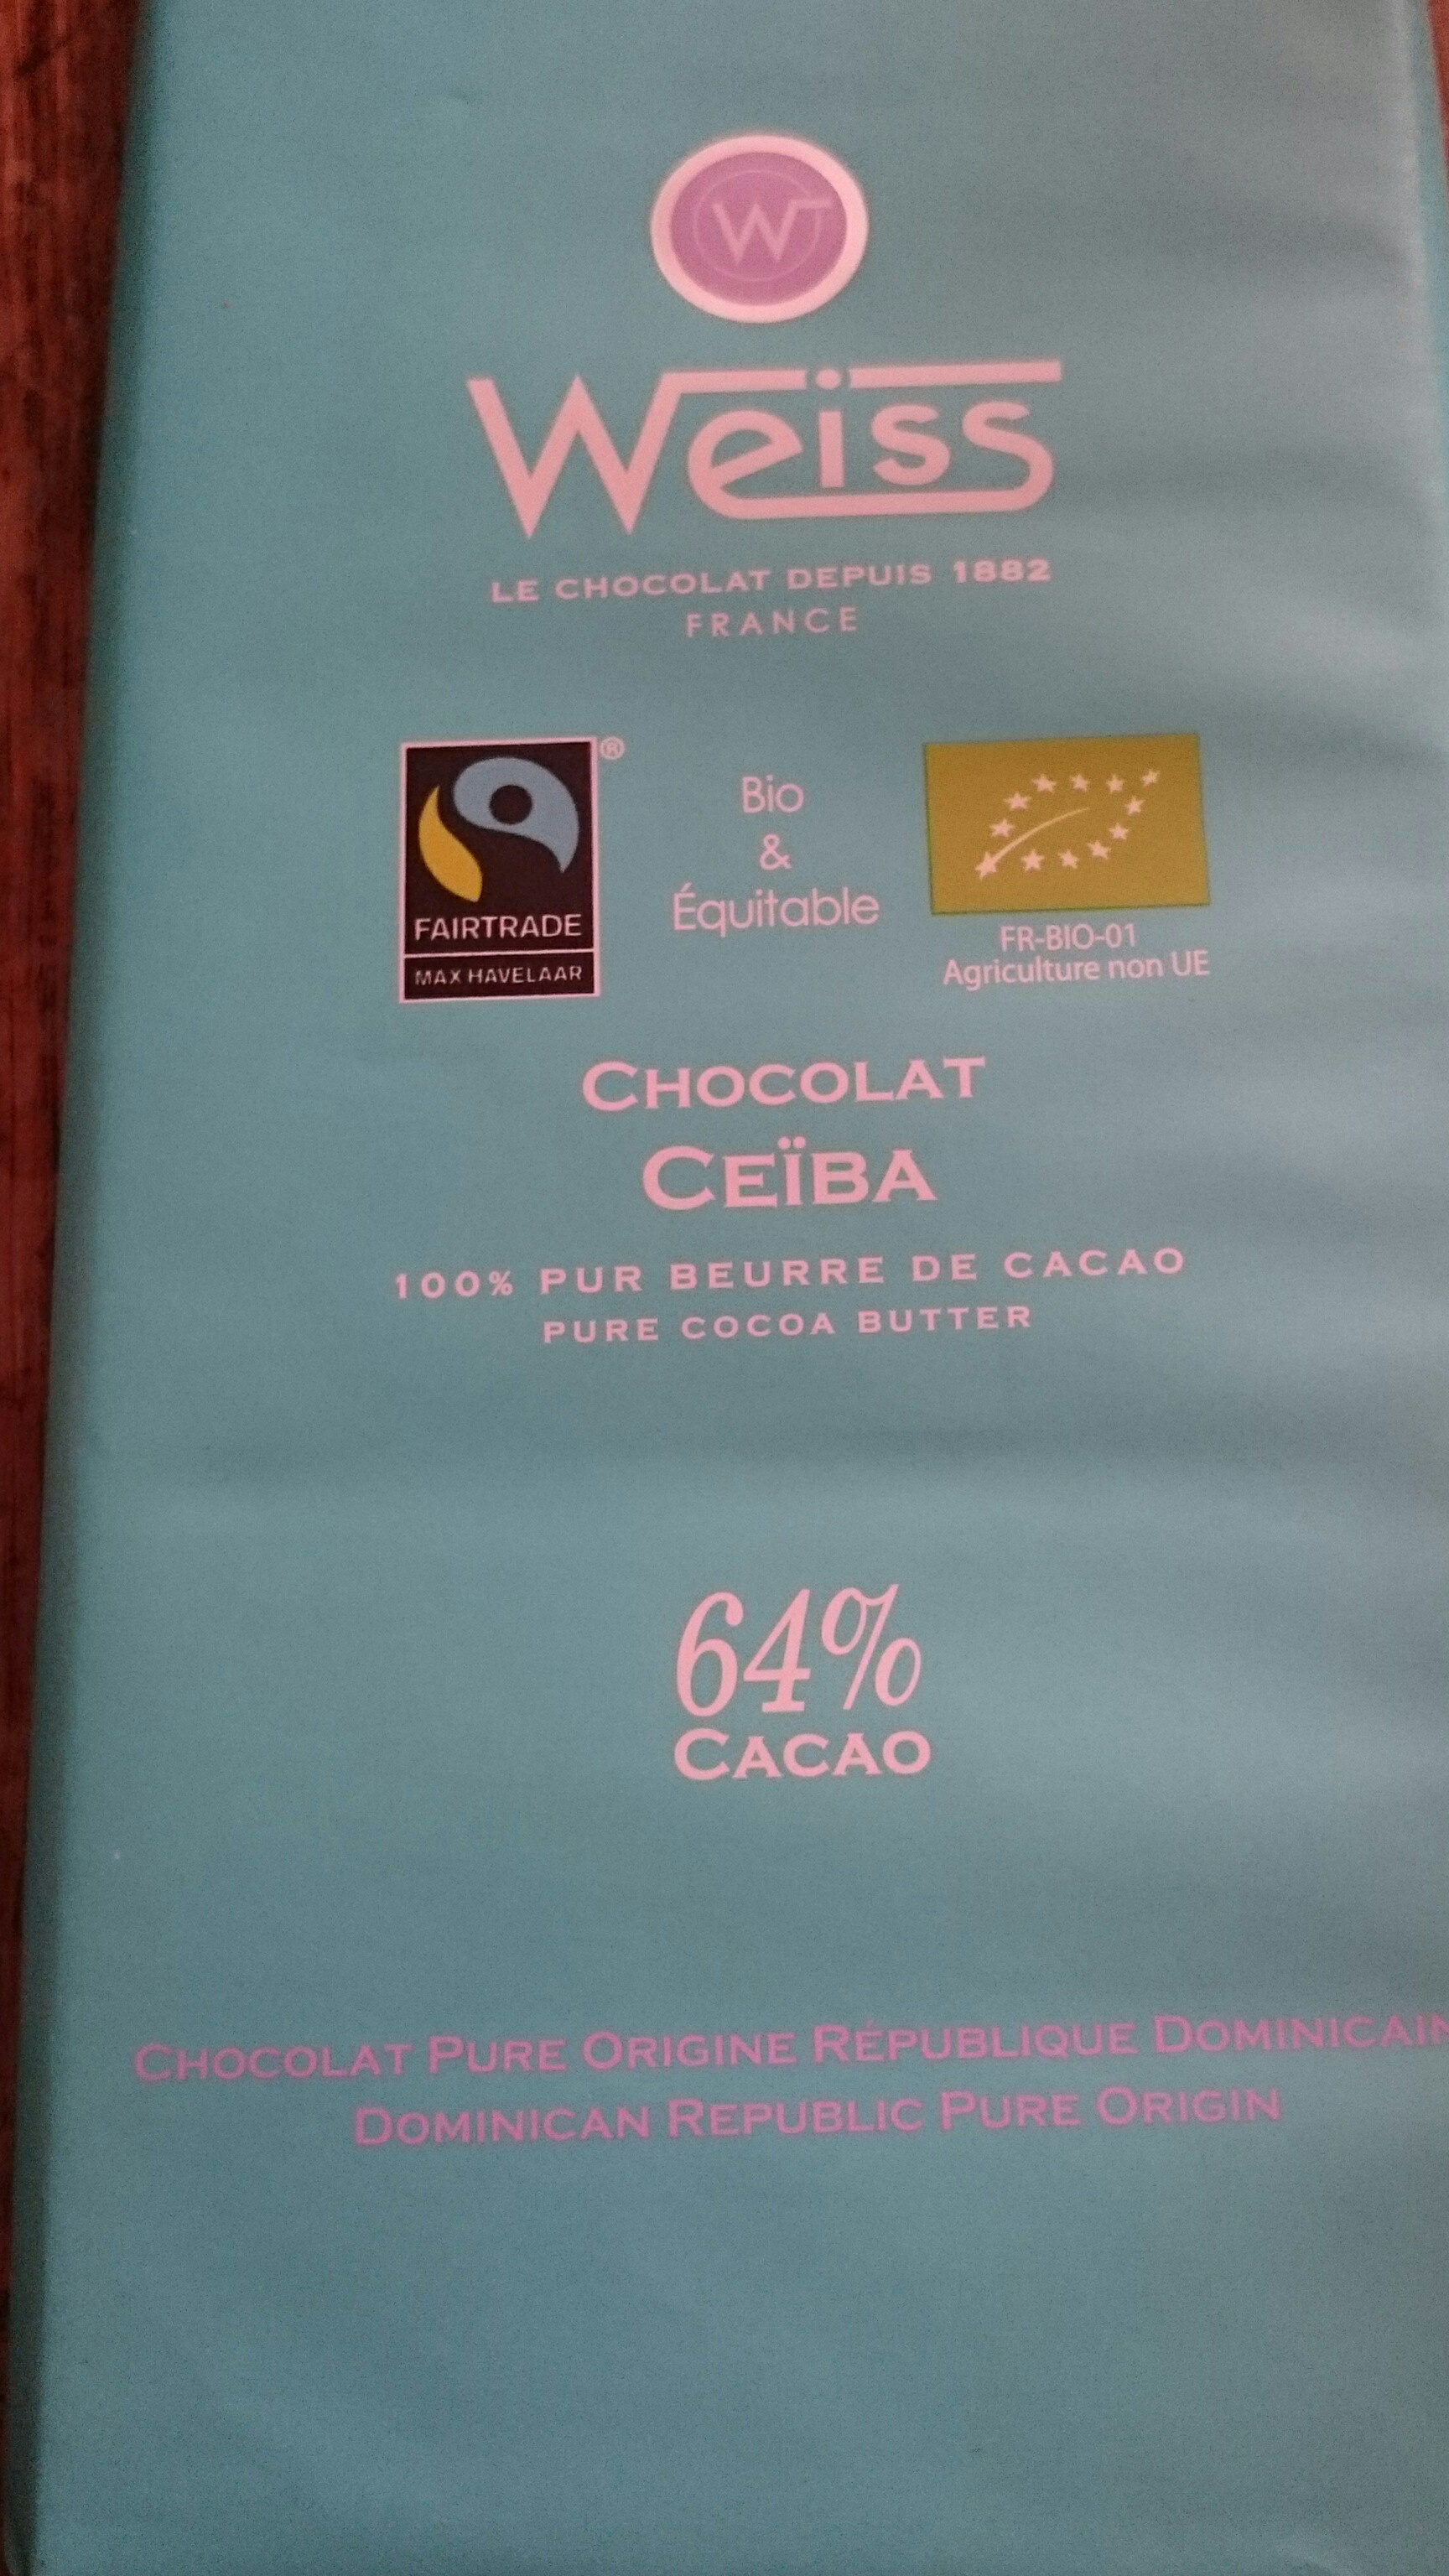 Tablette Chocolat Noir - Ceiba - Produit - fr